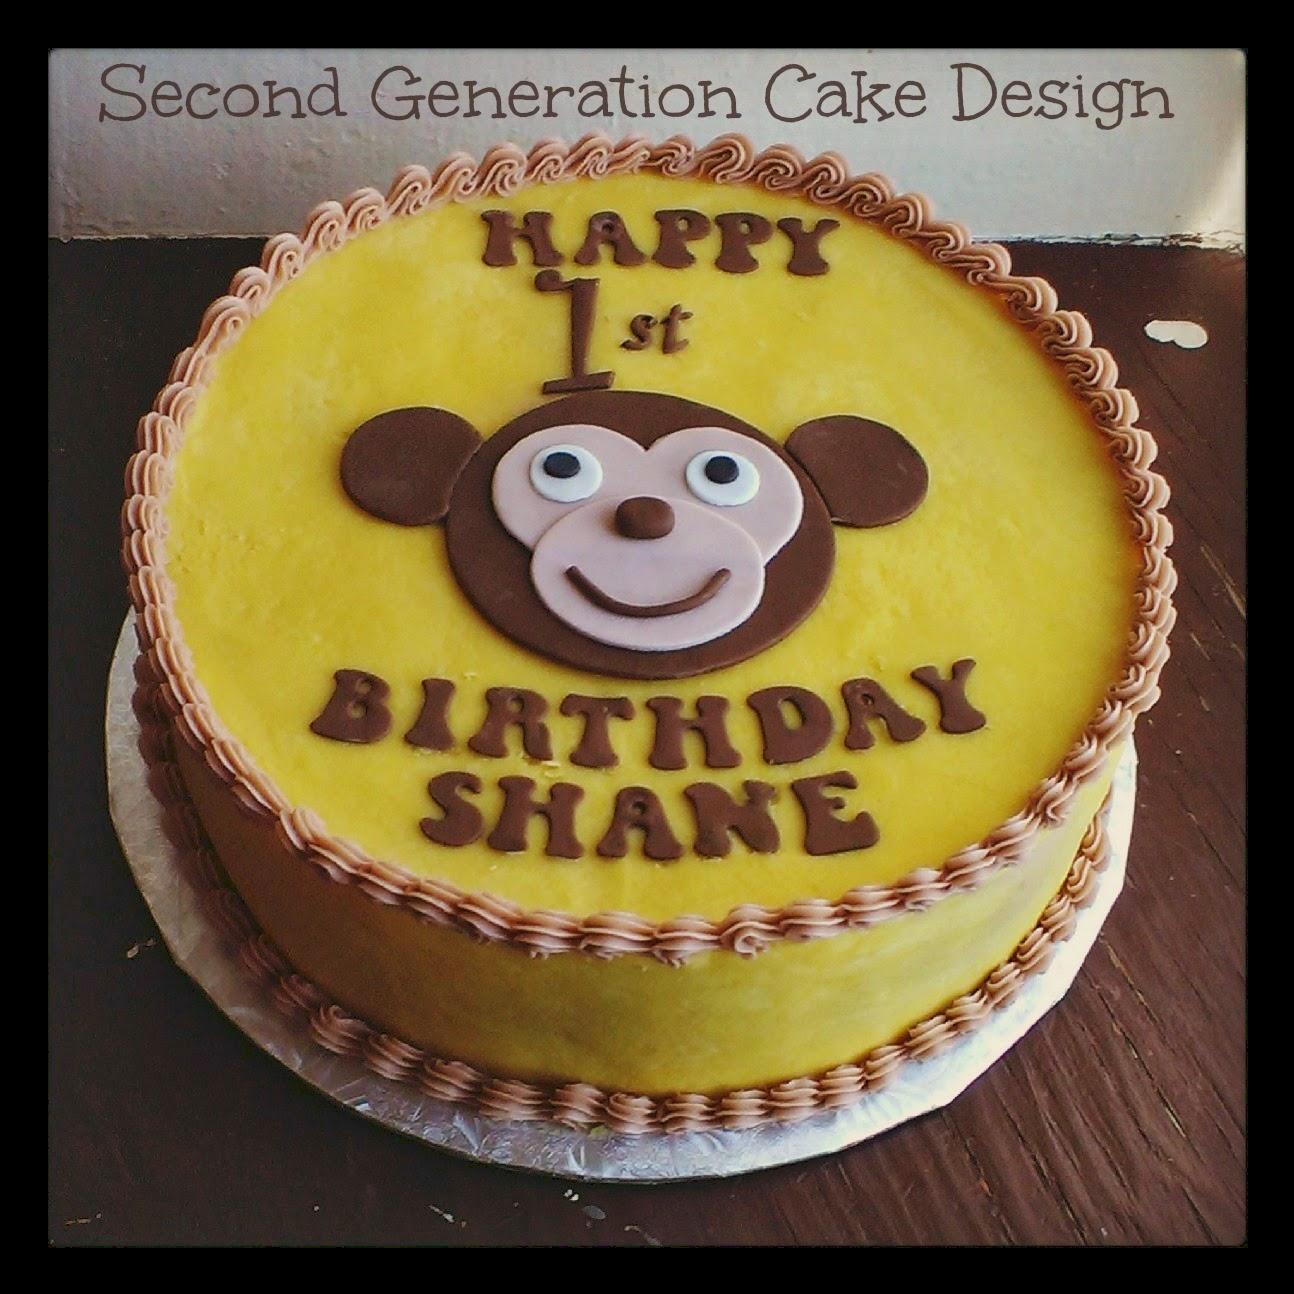 Second Generation Cake Design Monkey 1st Birthday Cake